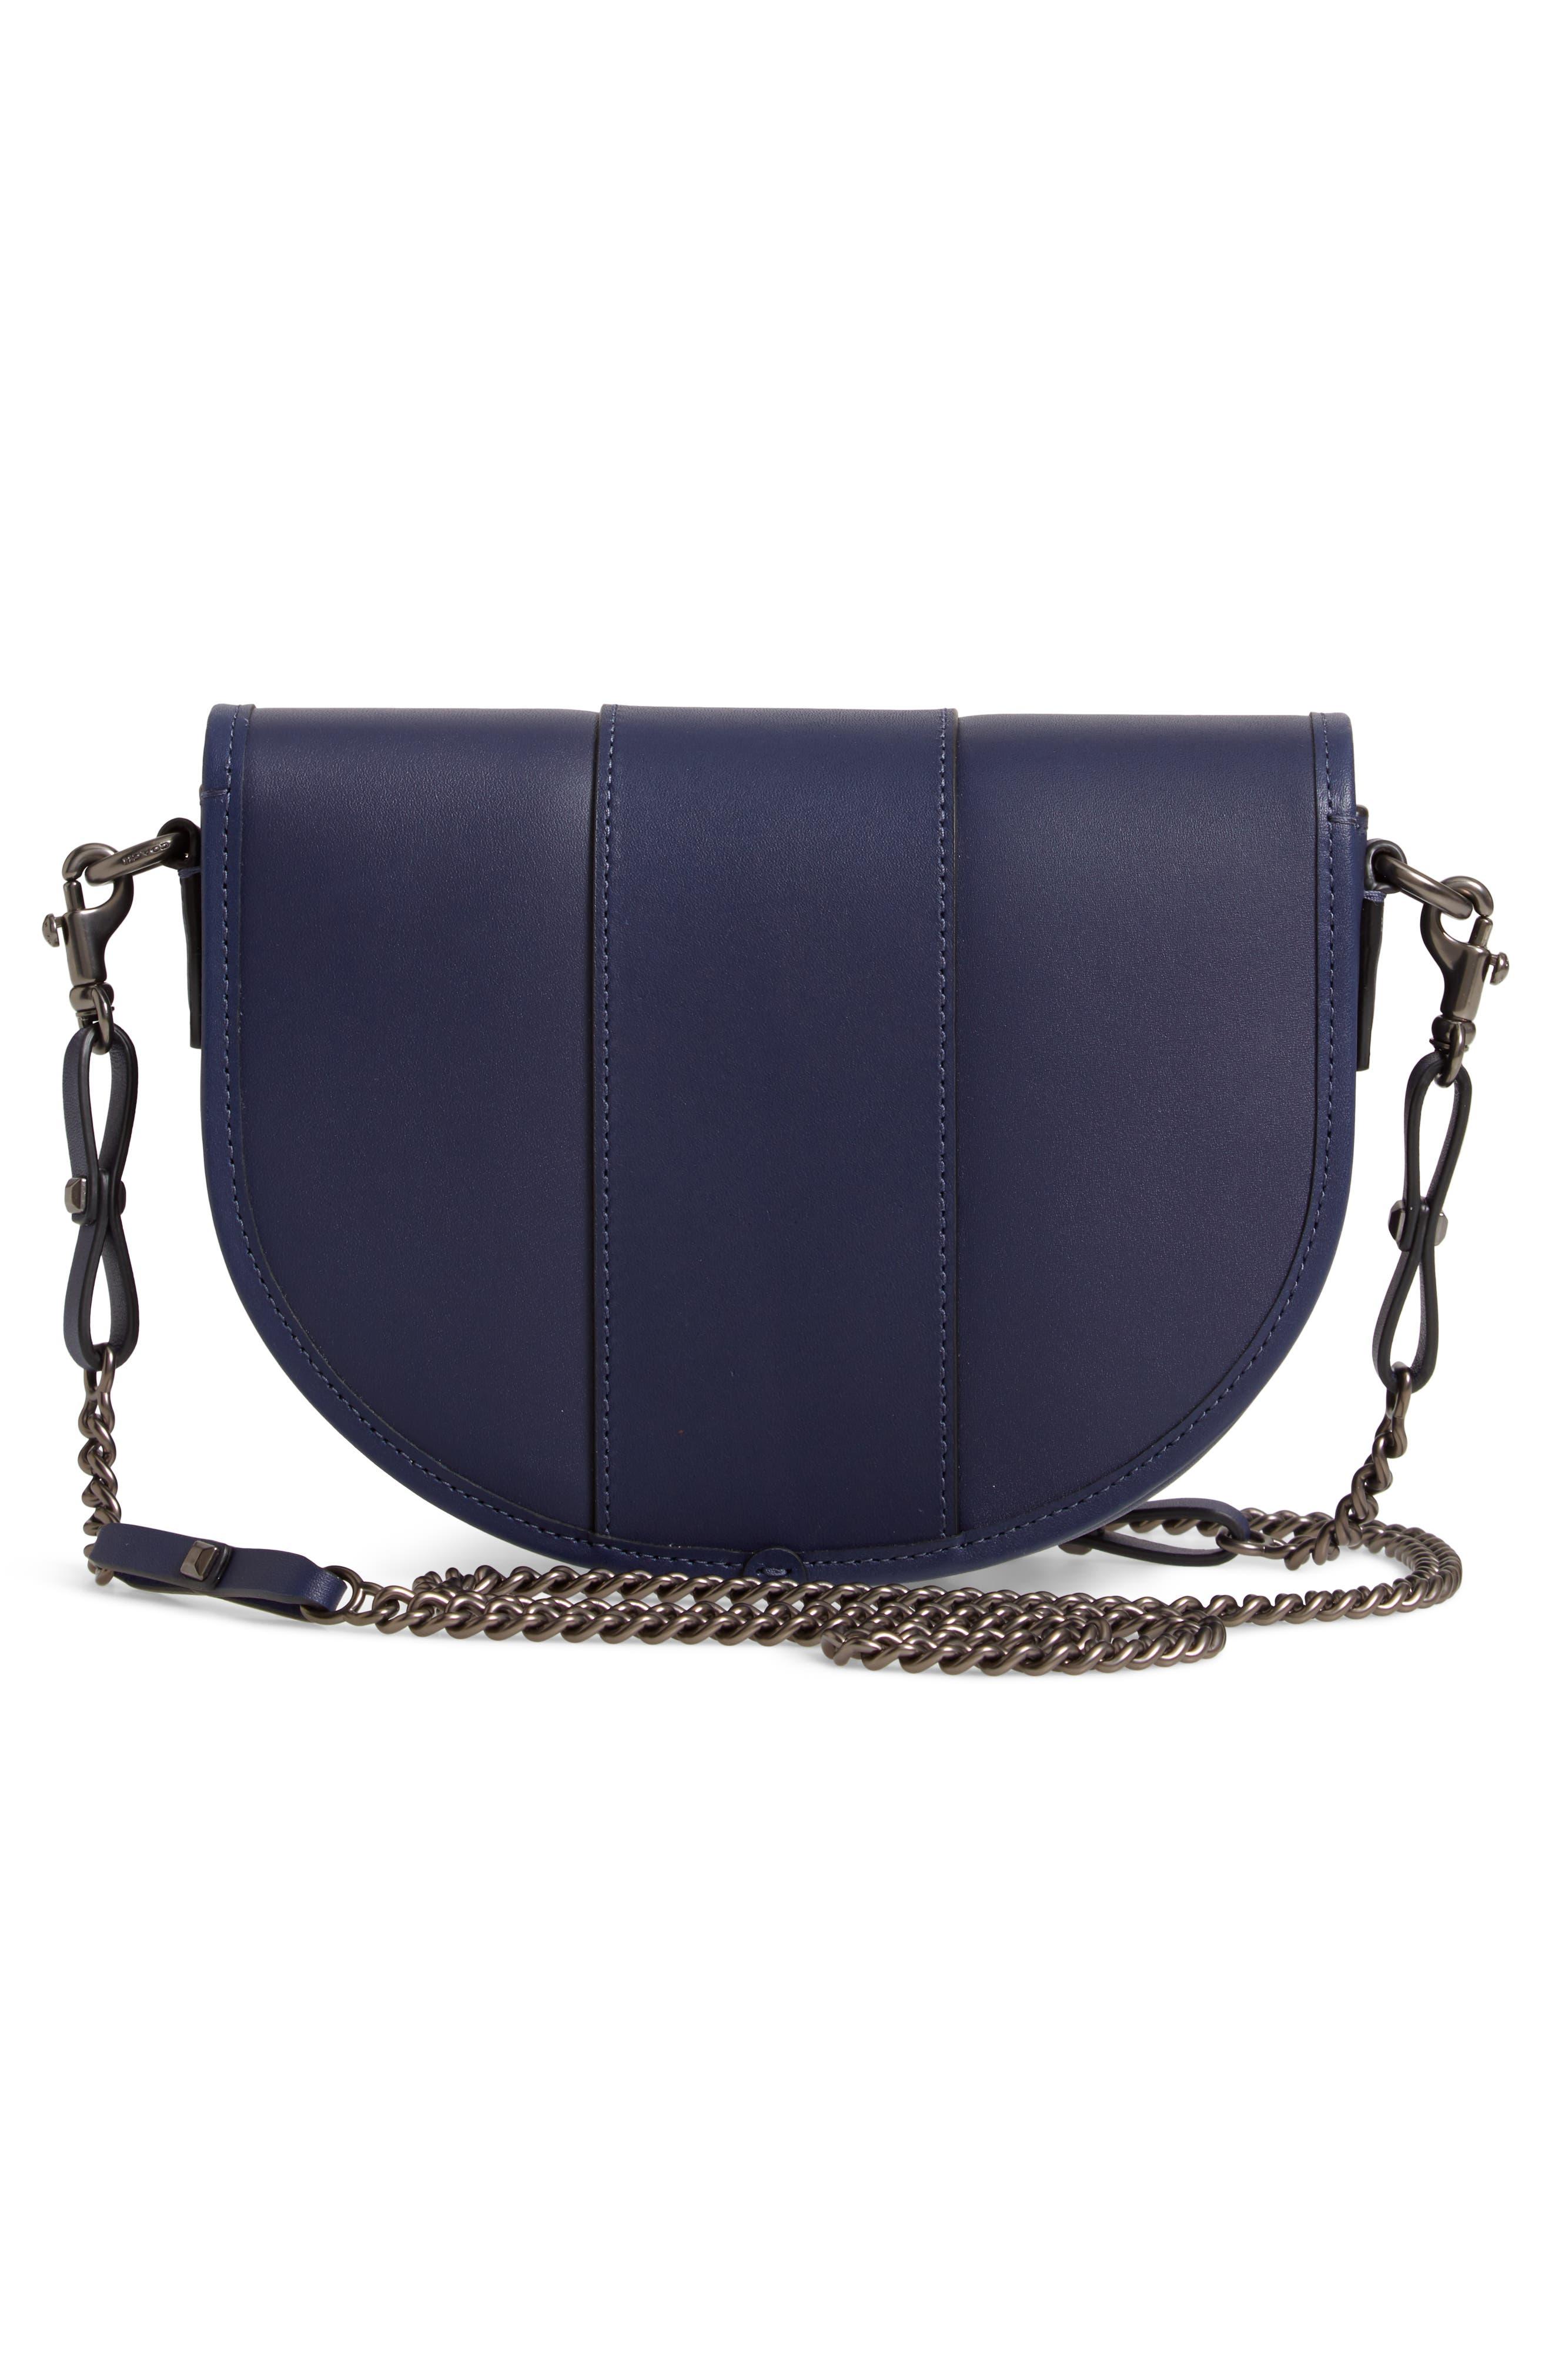 COACH, Saddle 20 Leather Saddle Bag, Alternate thumbnail 4, color, CADET